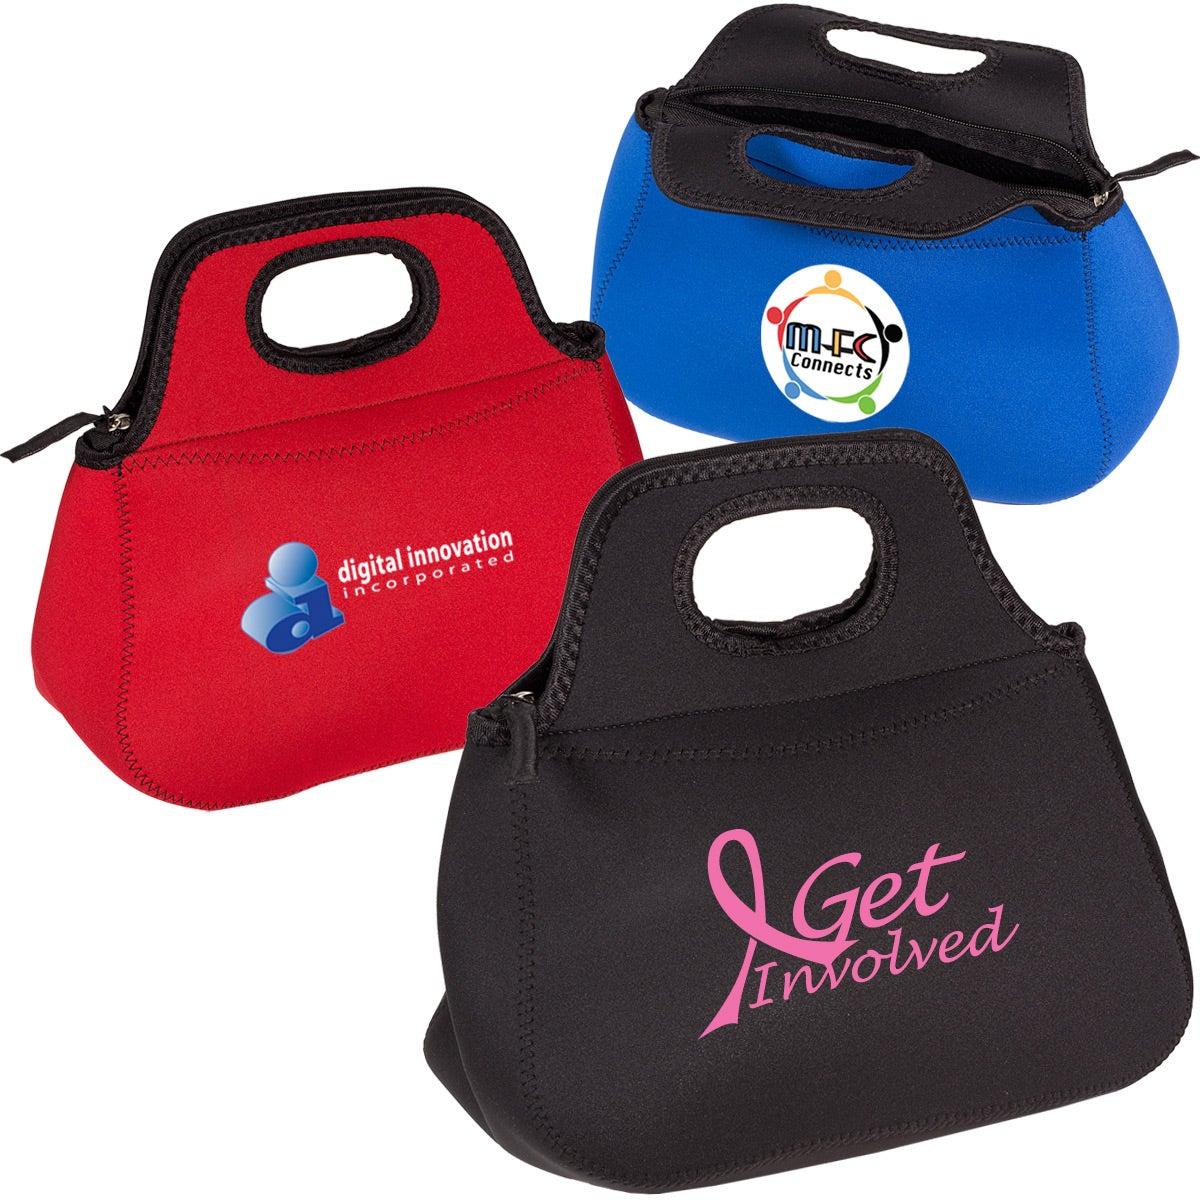 Zippered Neoprene Lunch Tote Bag